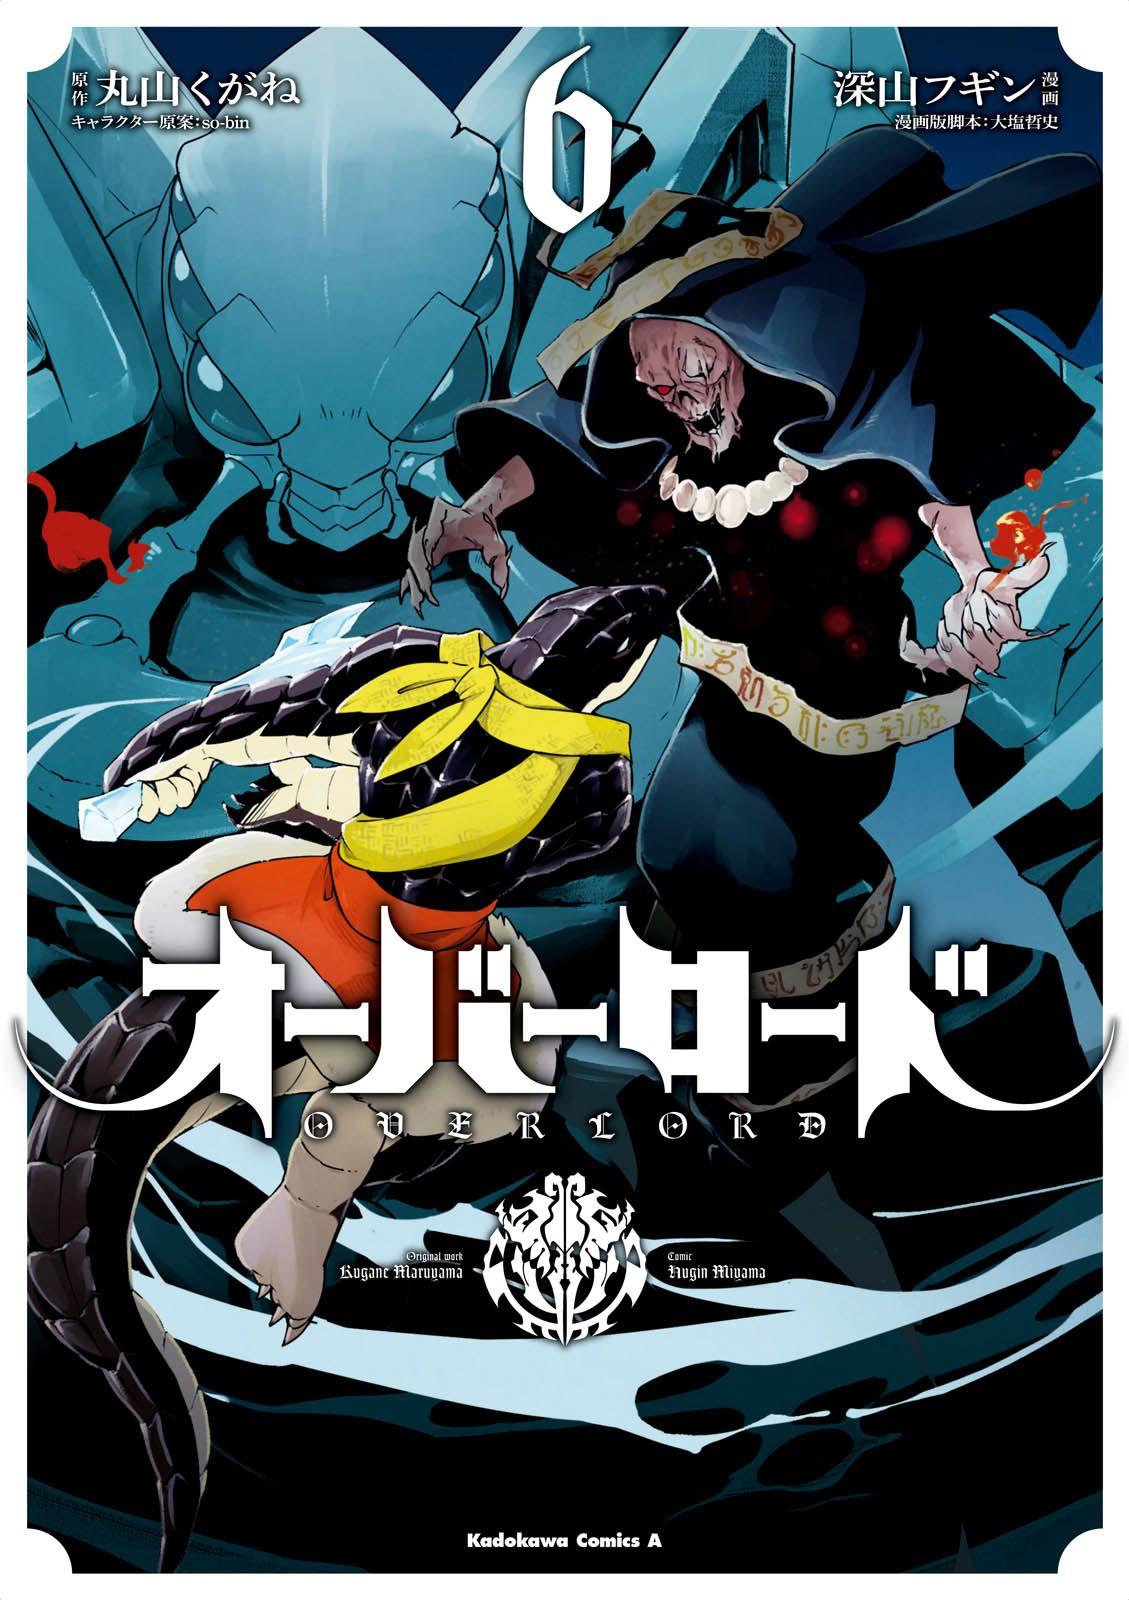 Overlord Manga Volume 06